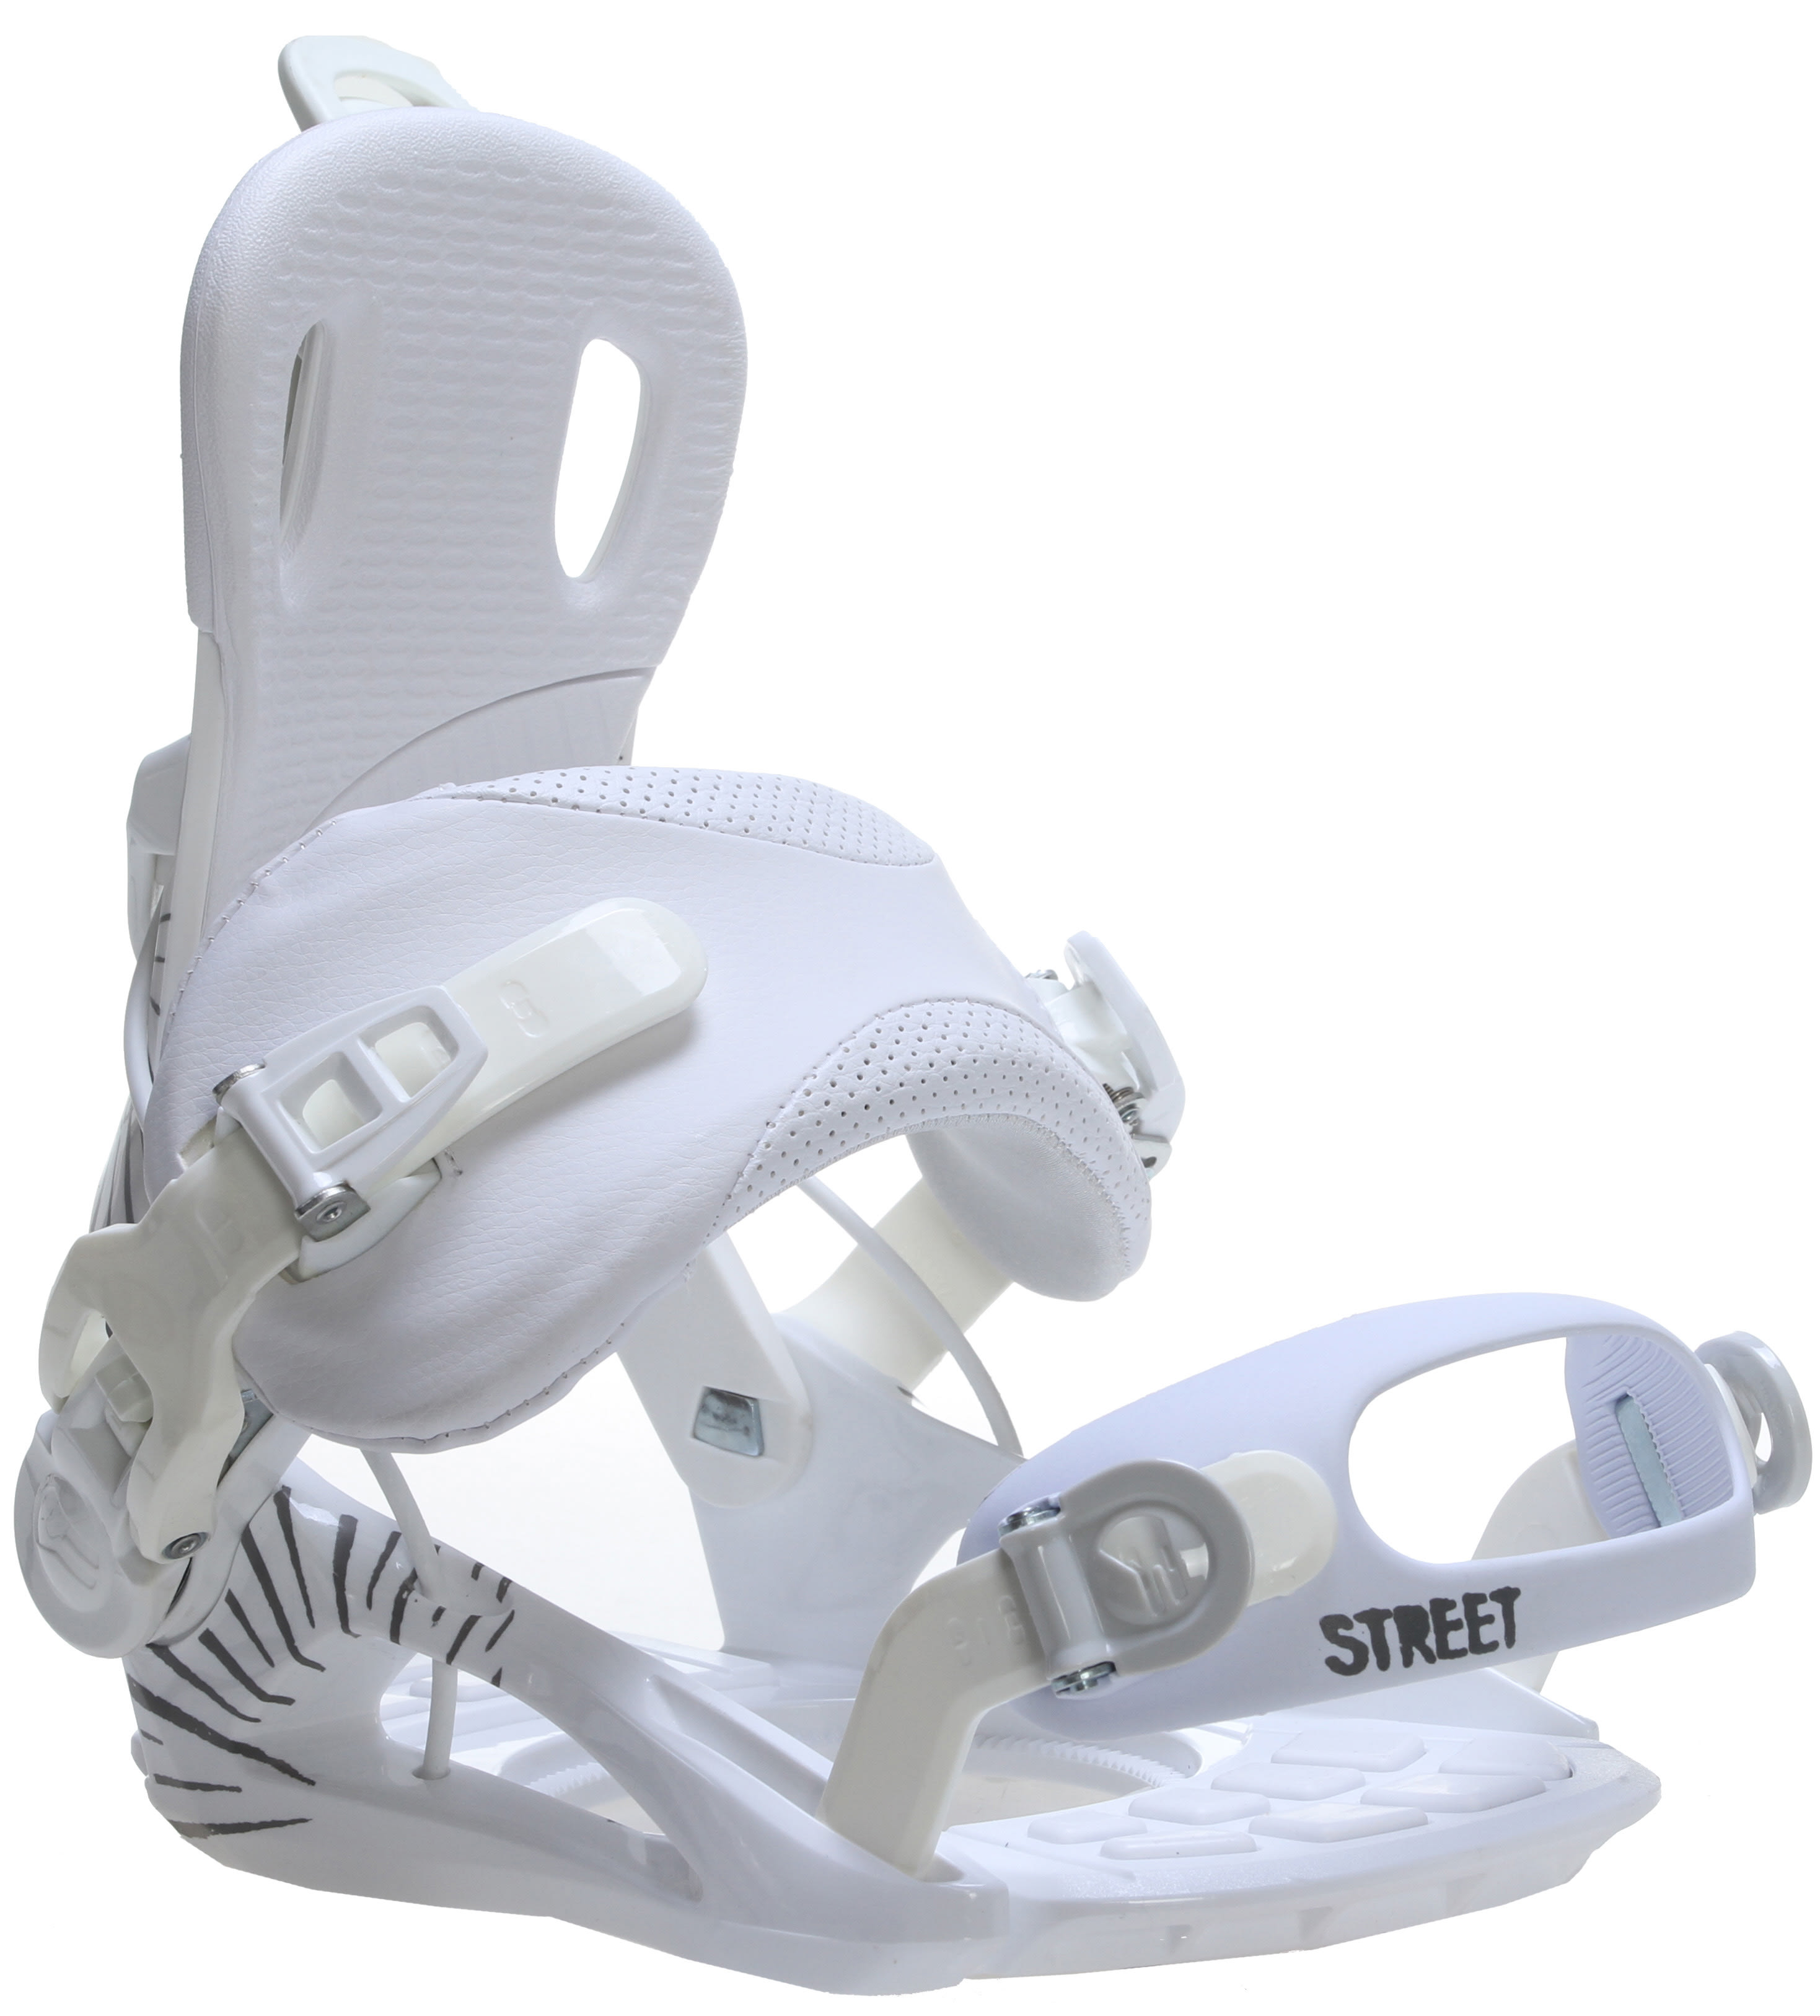 GNU Street Snowboard Bindings White Mens Sz S (4-7)